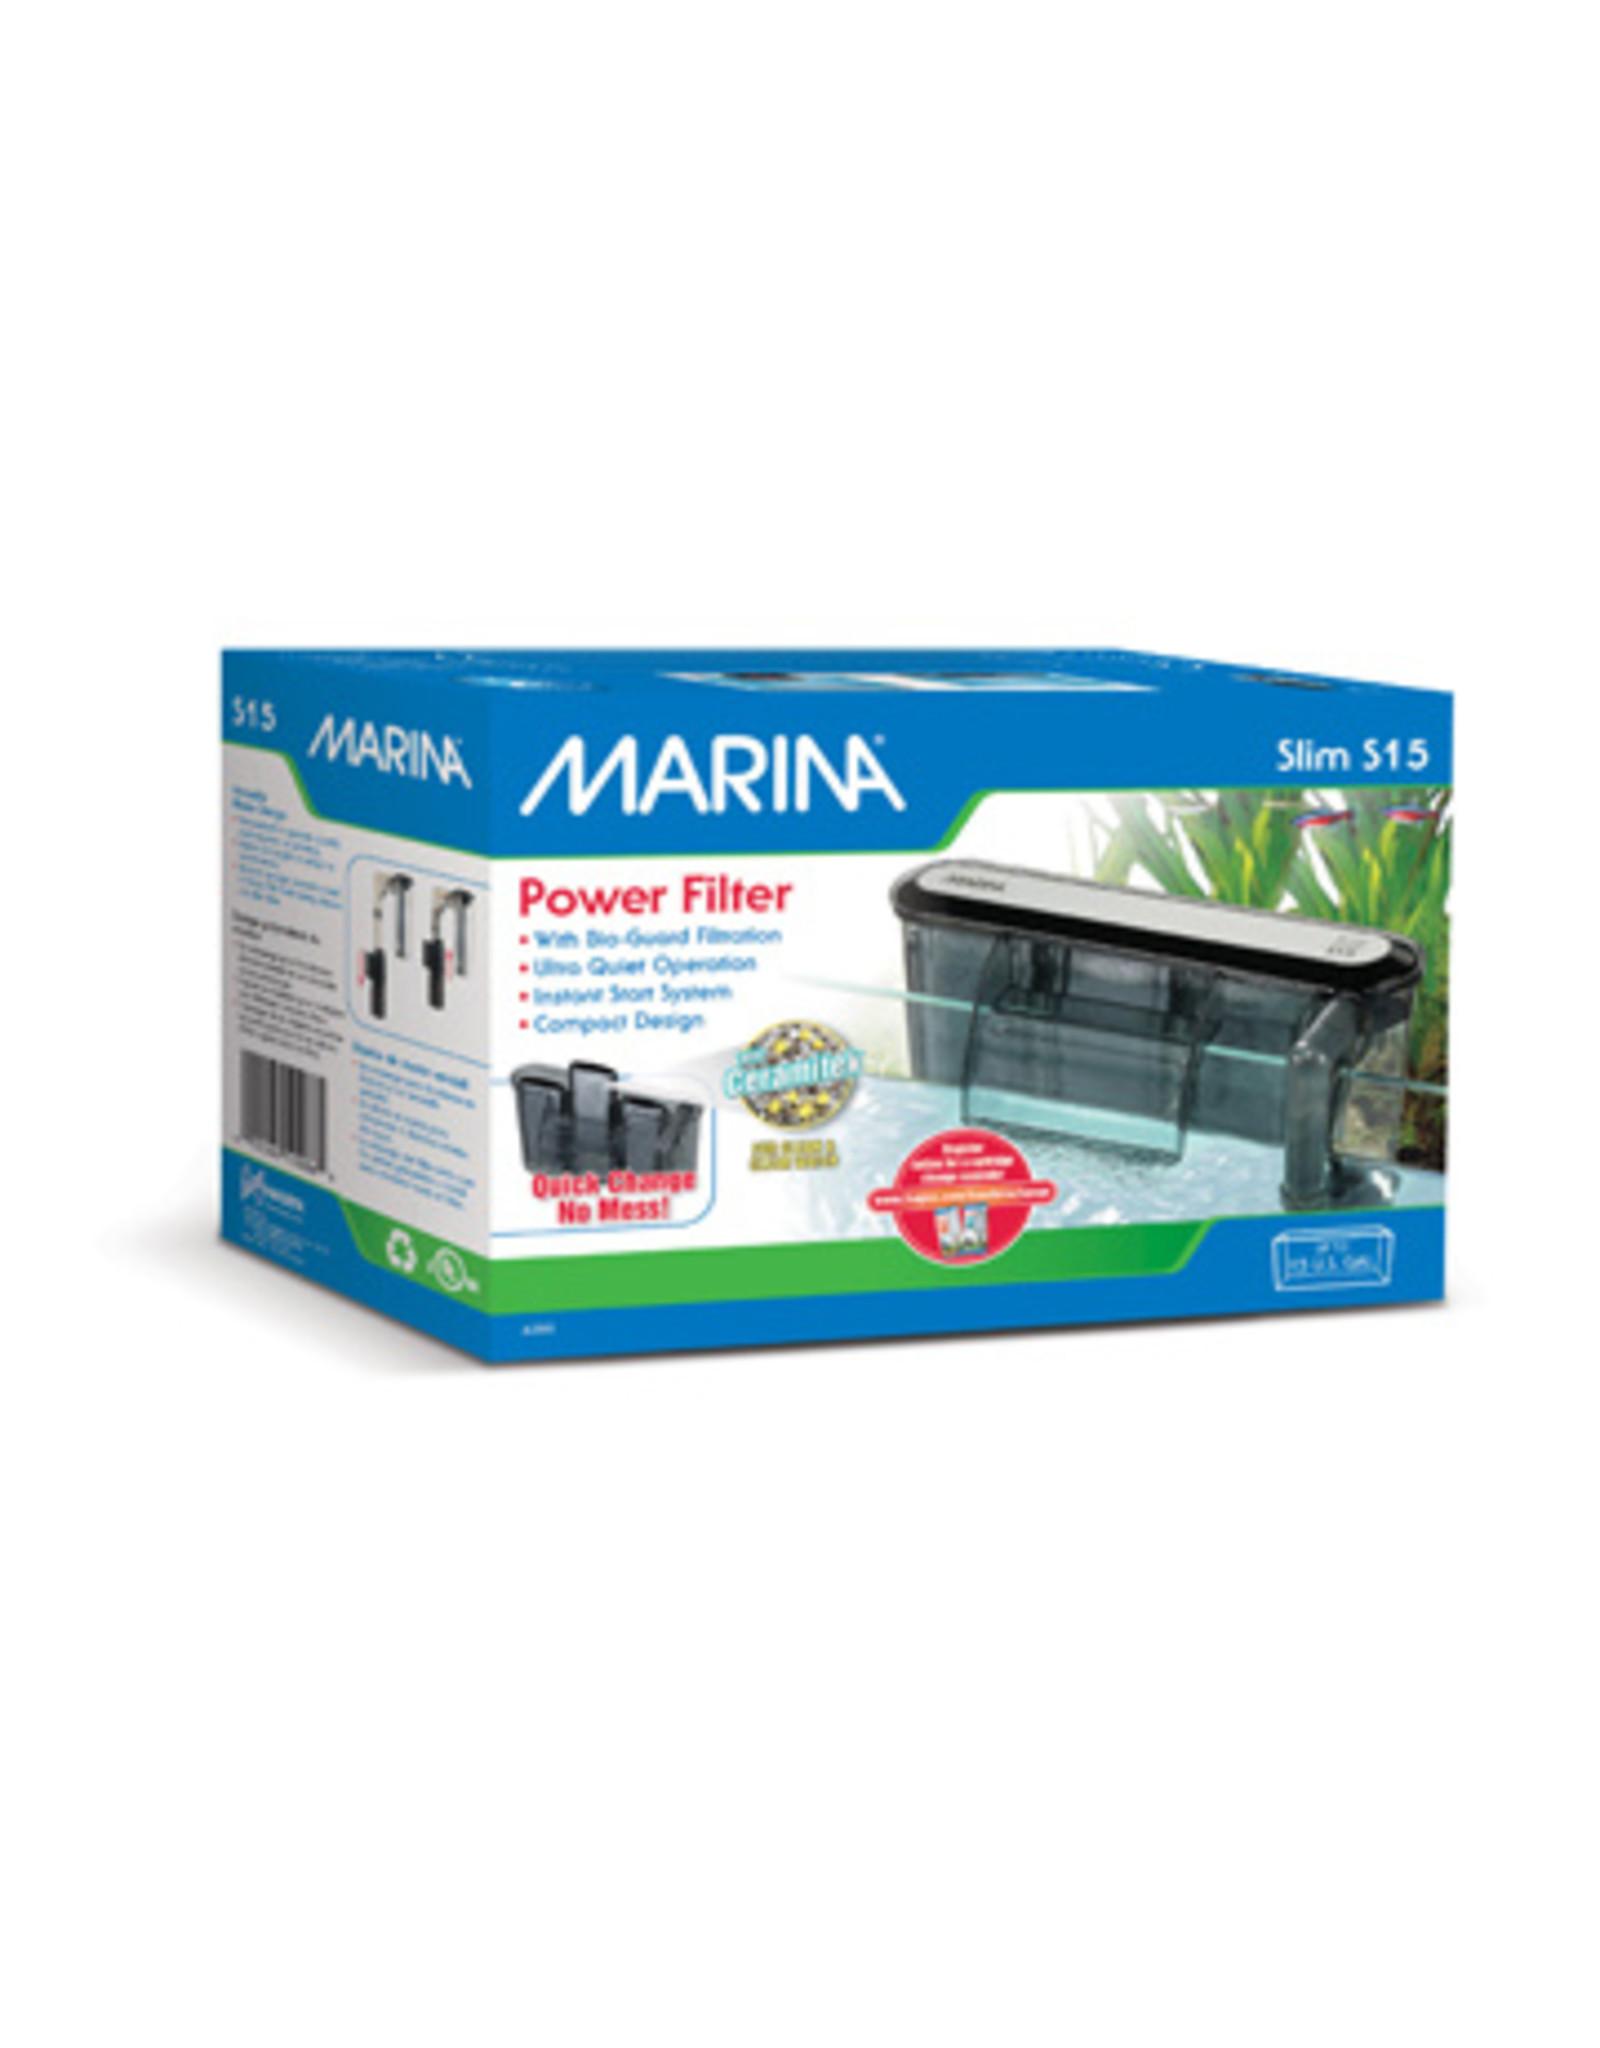 Marina MARINA Slim Filter